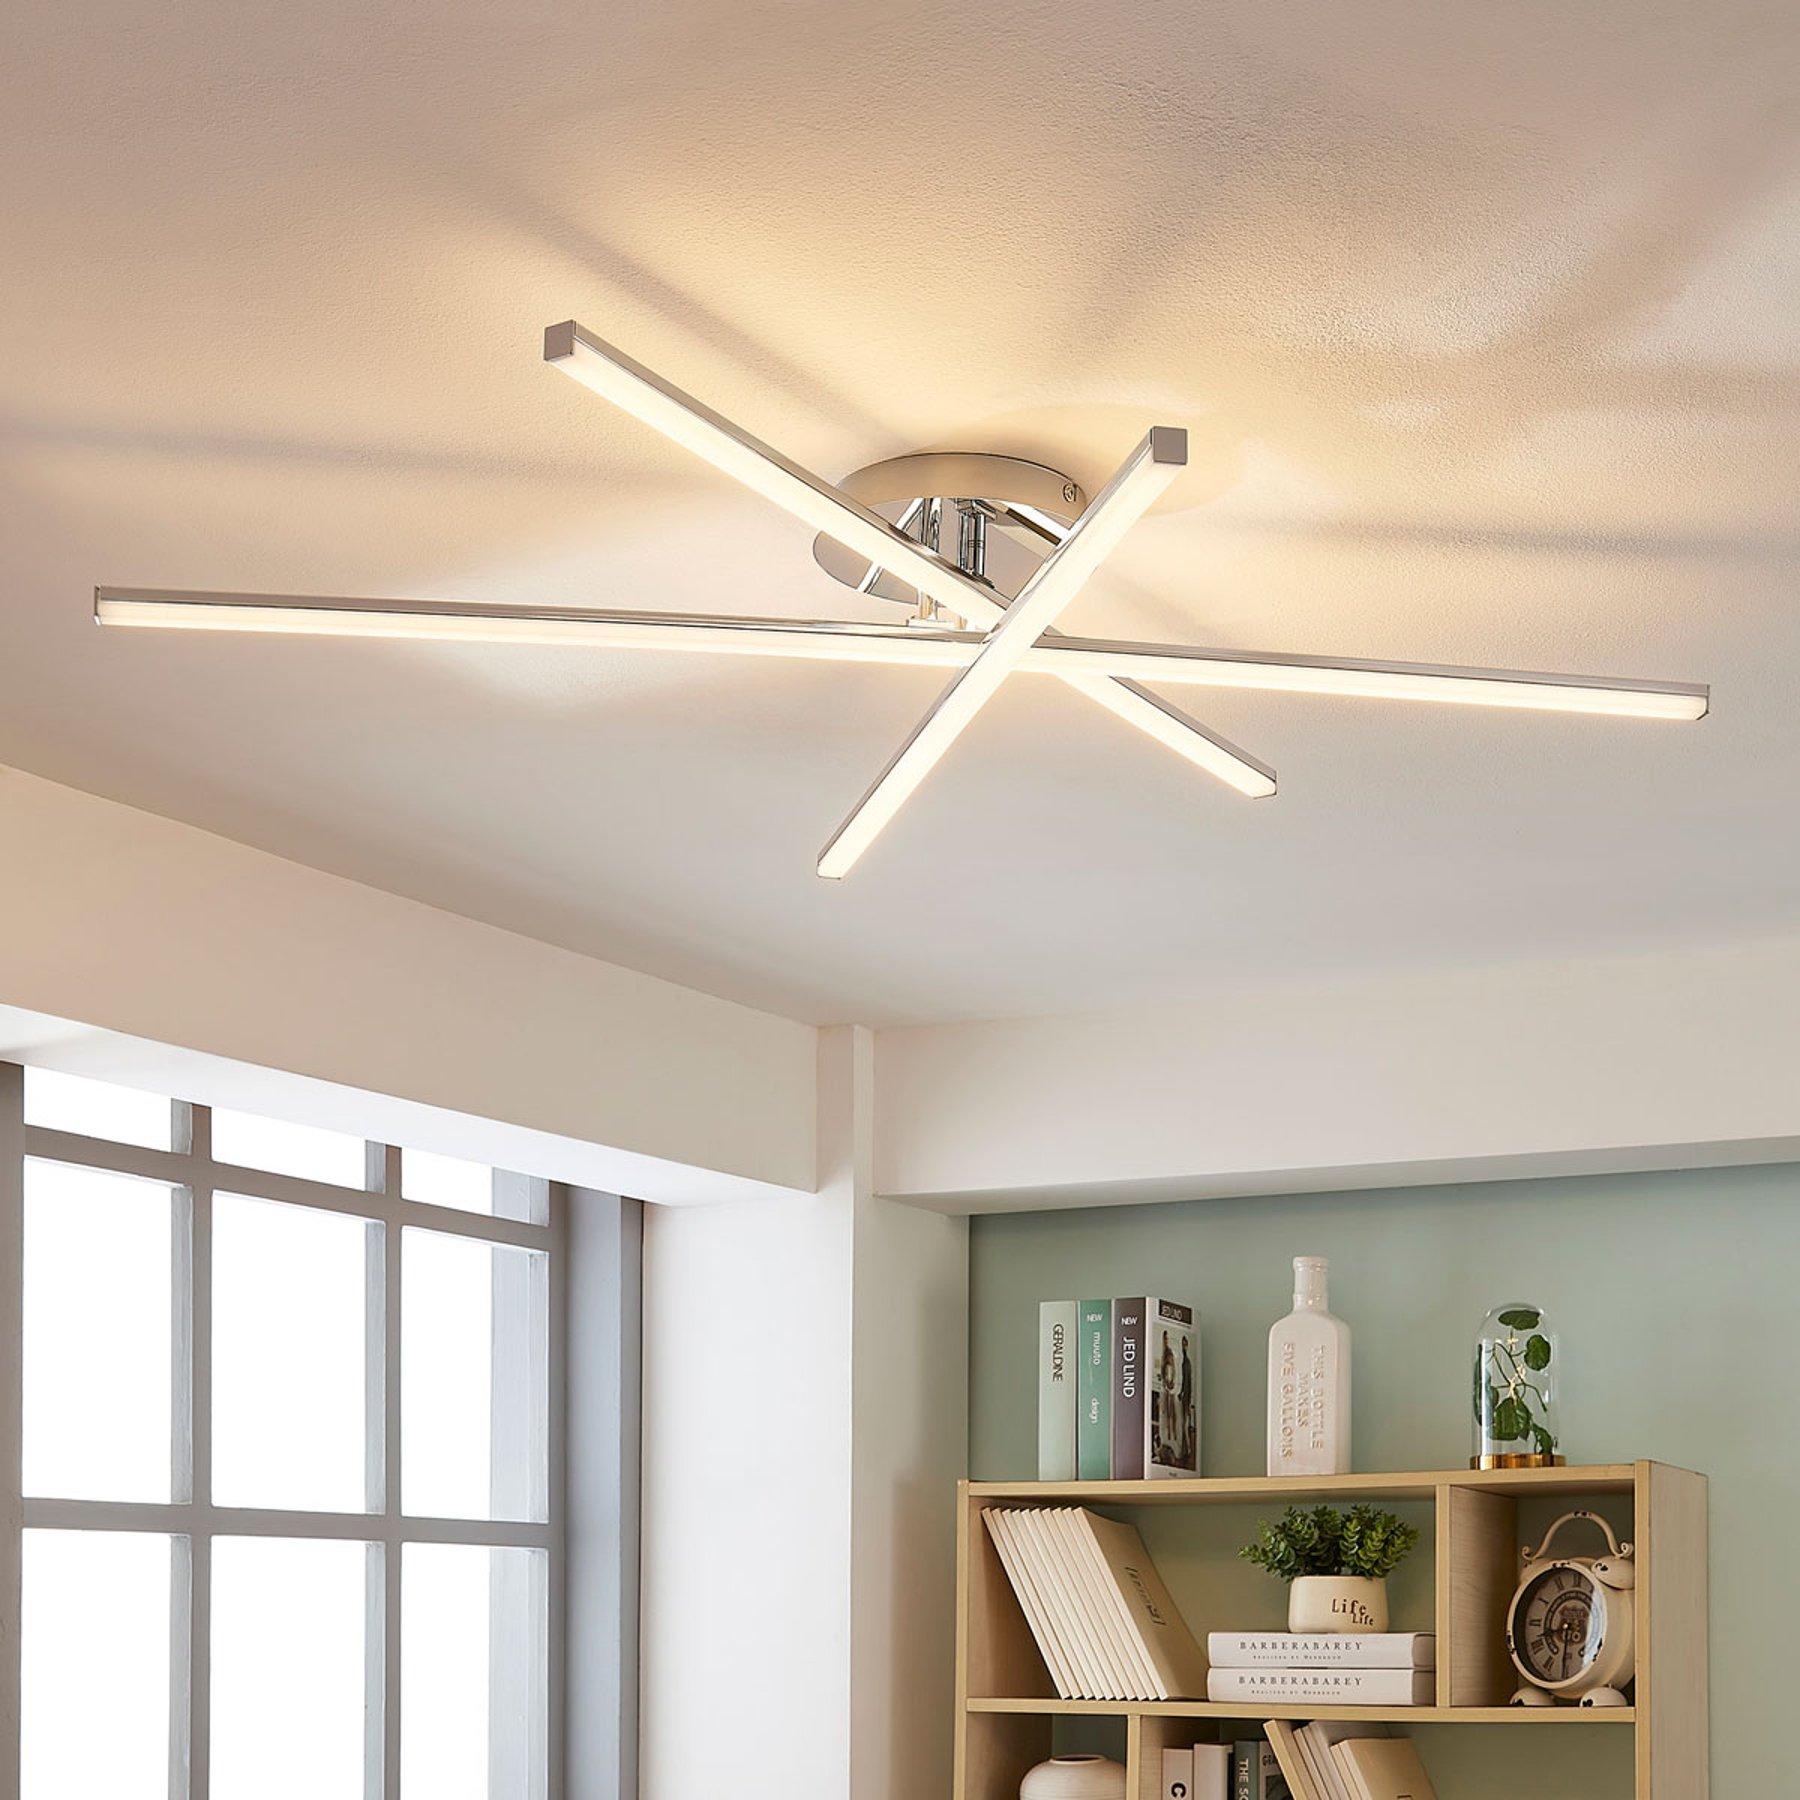 LED-taklampe Korona med 3 lys, dimbar